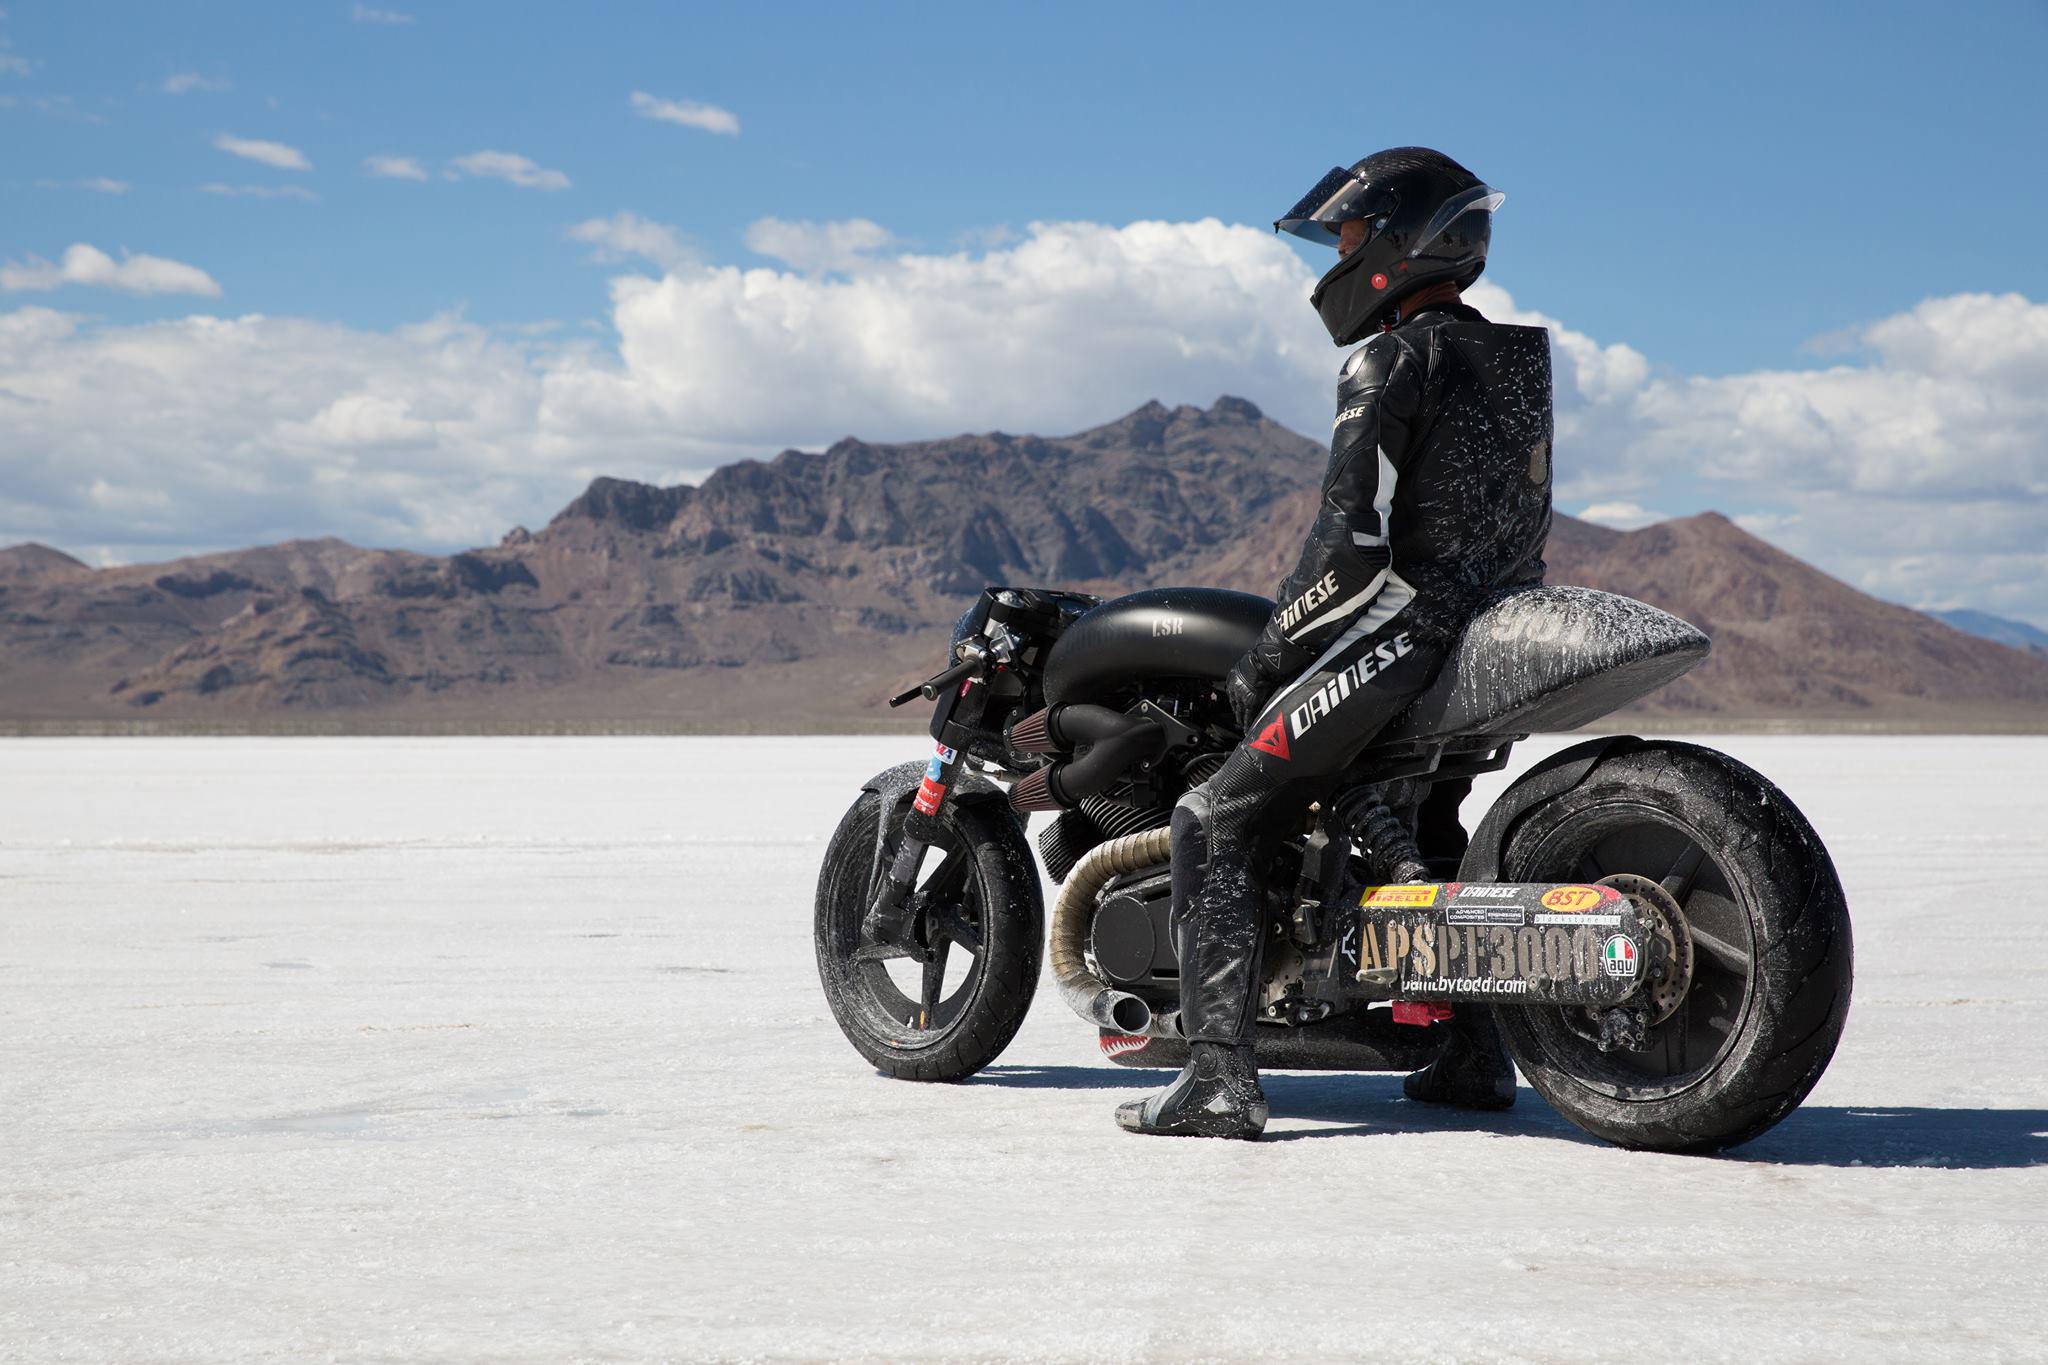 Blackstone Tek Bst Carbon Fibre Motorcycle Racing Wheels News